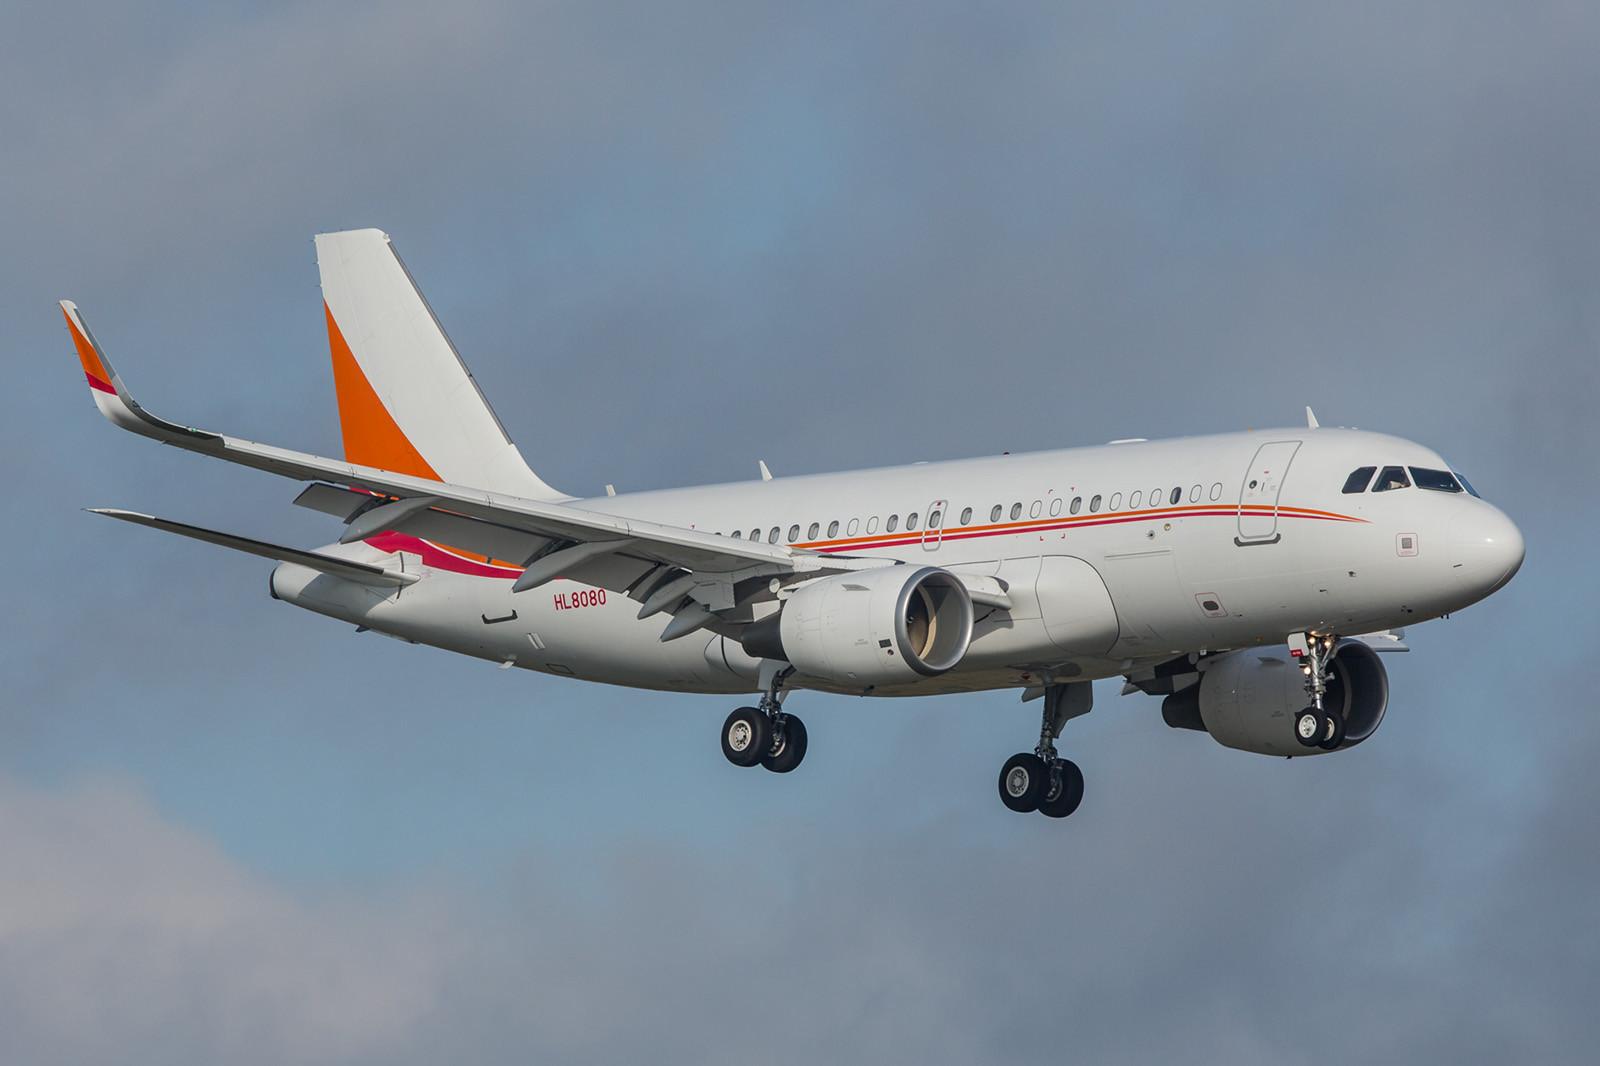 HL8080; SK Telecom Airbus A319-115(CJ)